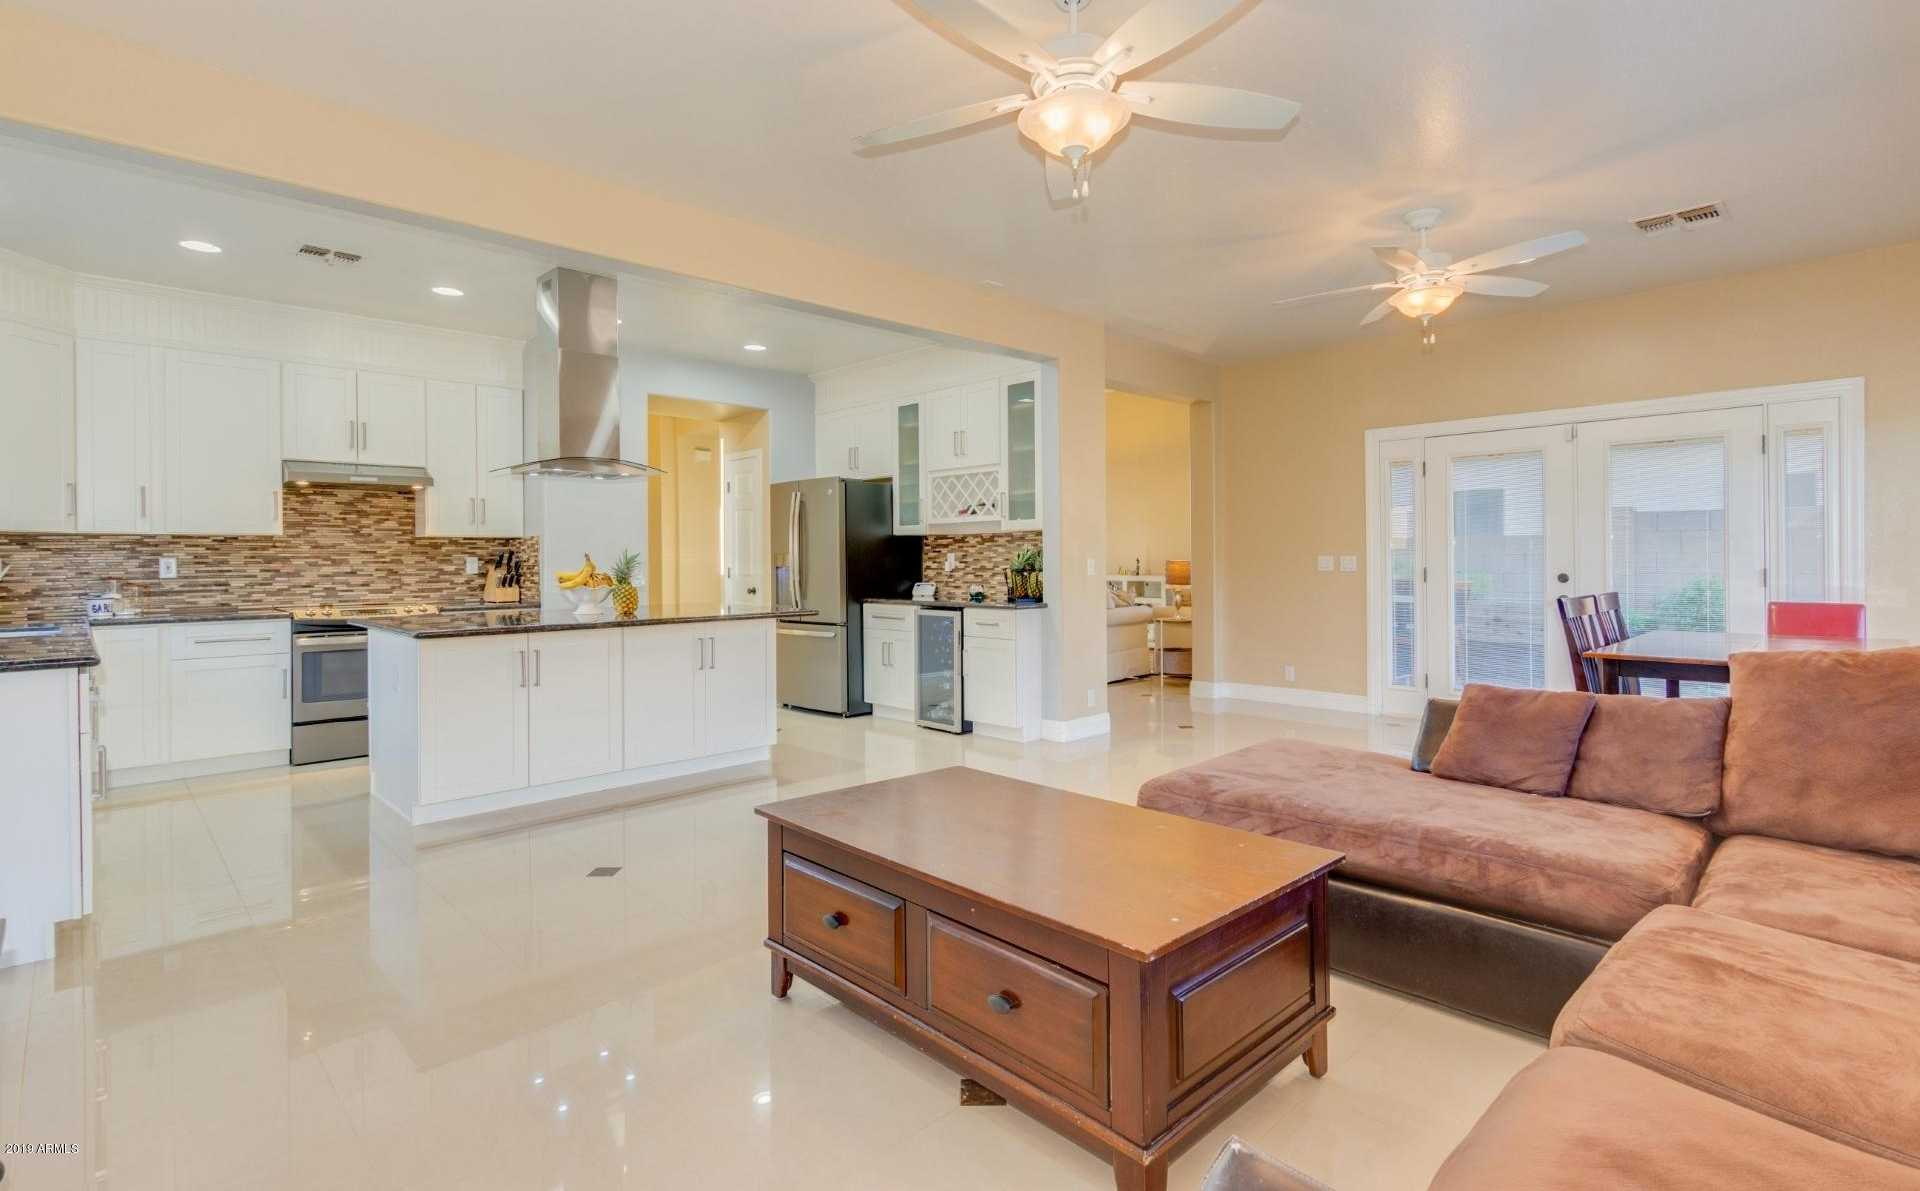 $375,000 - 5Br/3Ba - Home for Sale in Rancho Corona, Gilbert